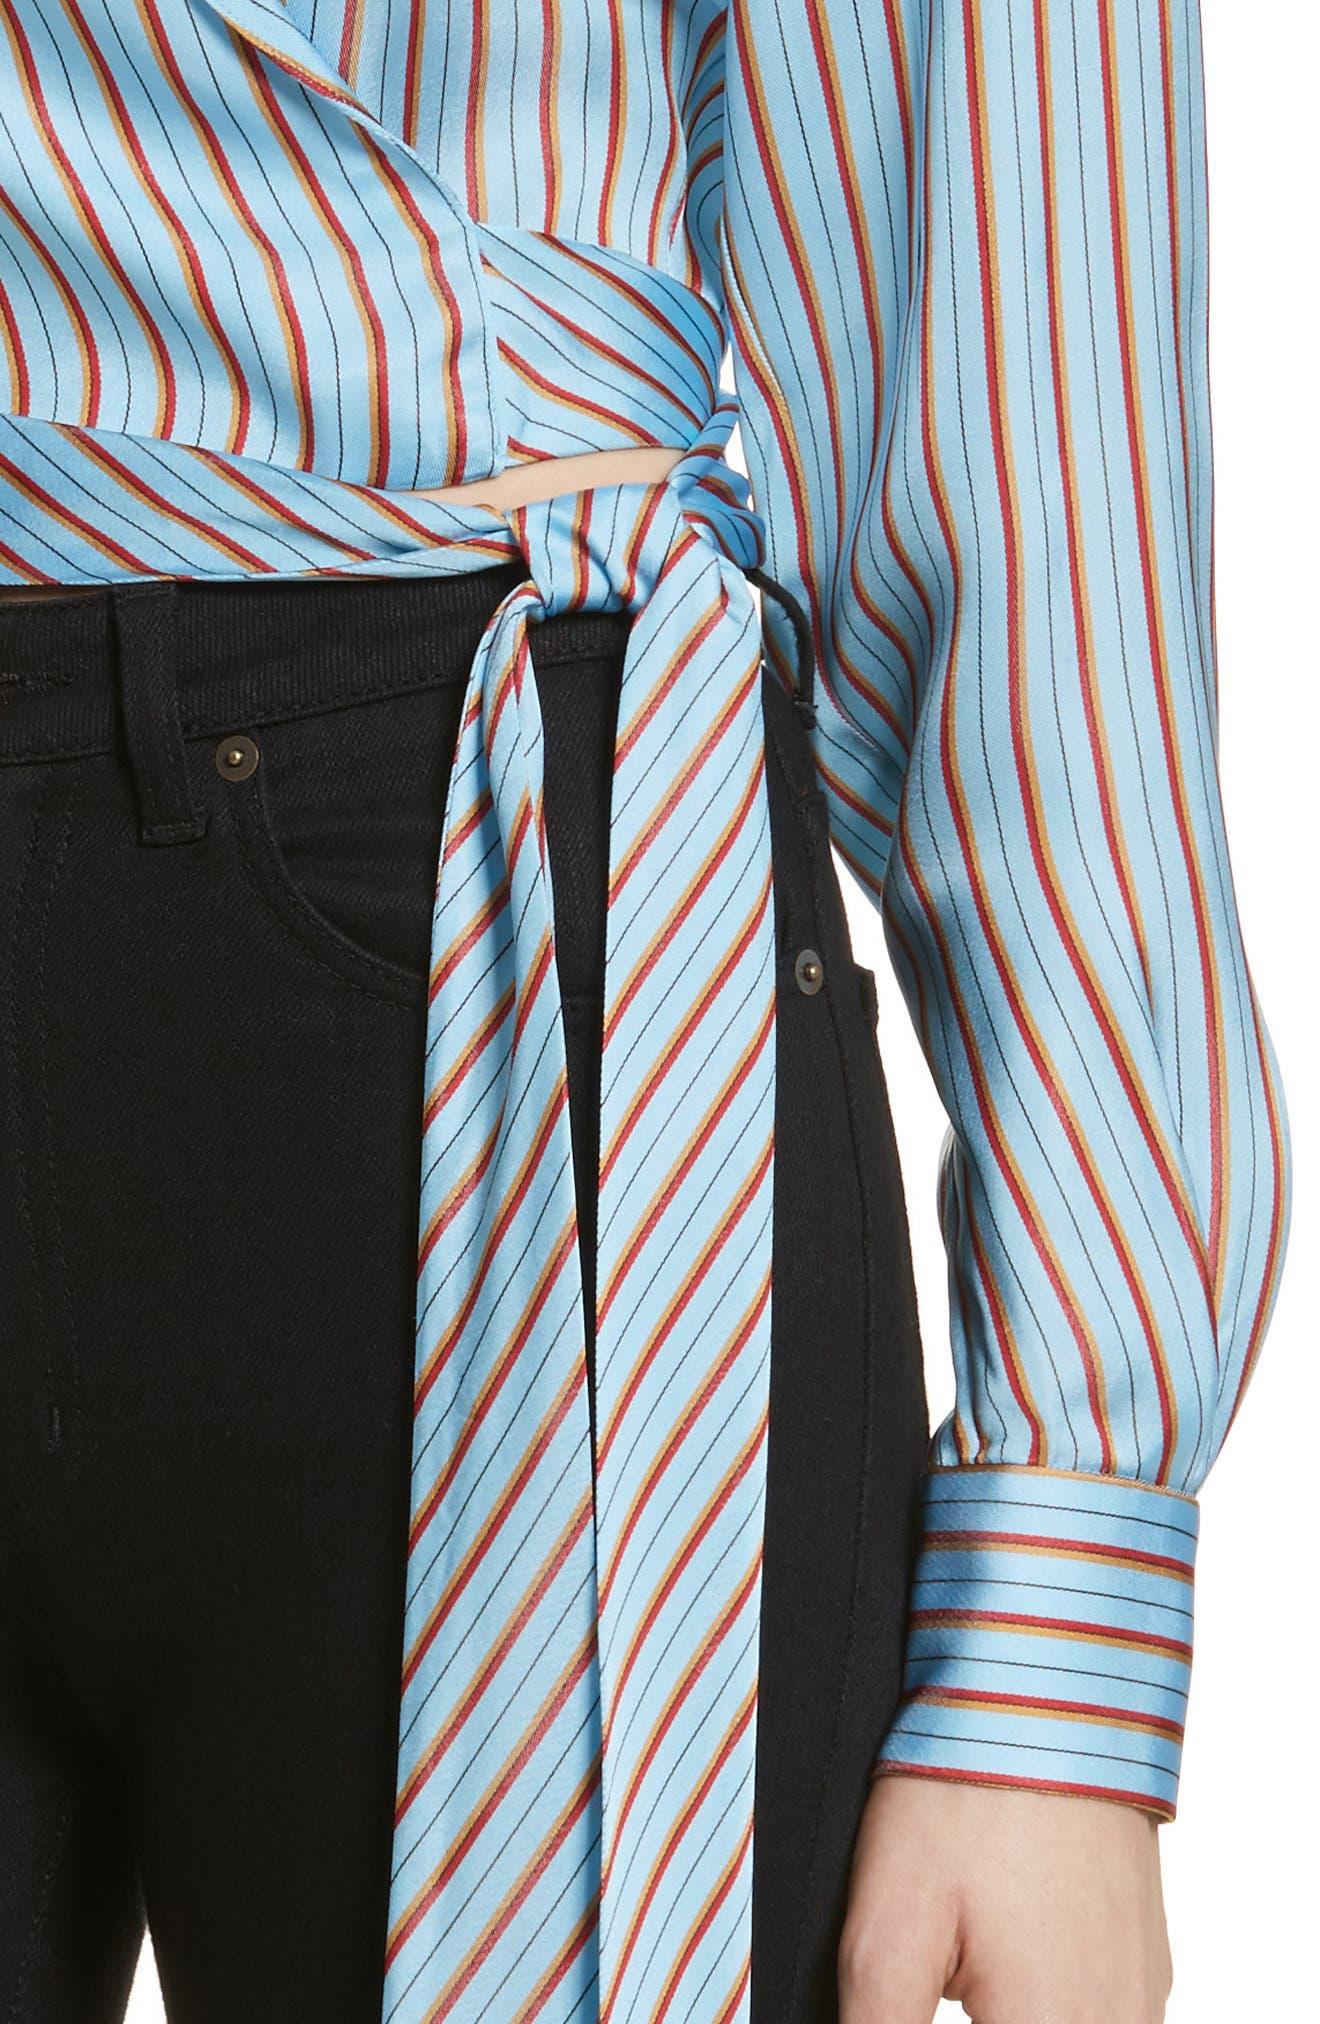 Diane von Furstenberg Stripe Wrap Top,                             Alternate thumbnail 4, color,                             477